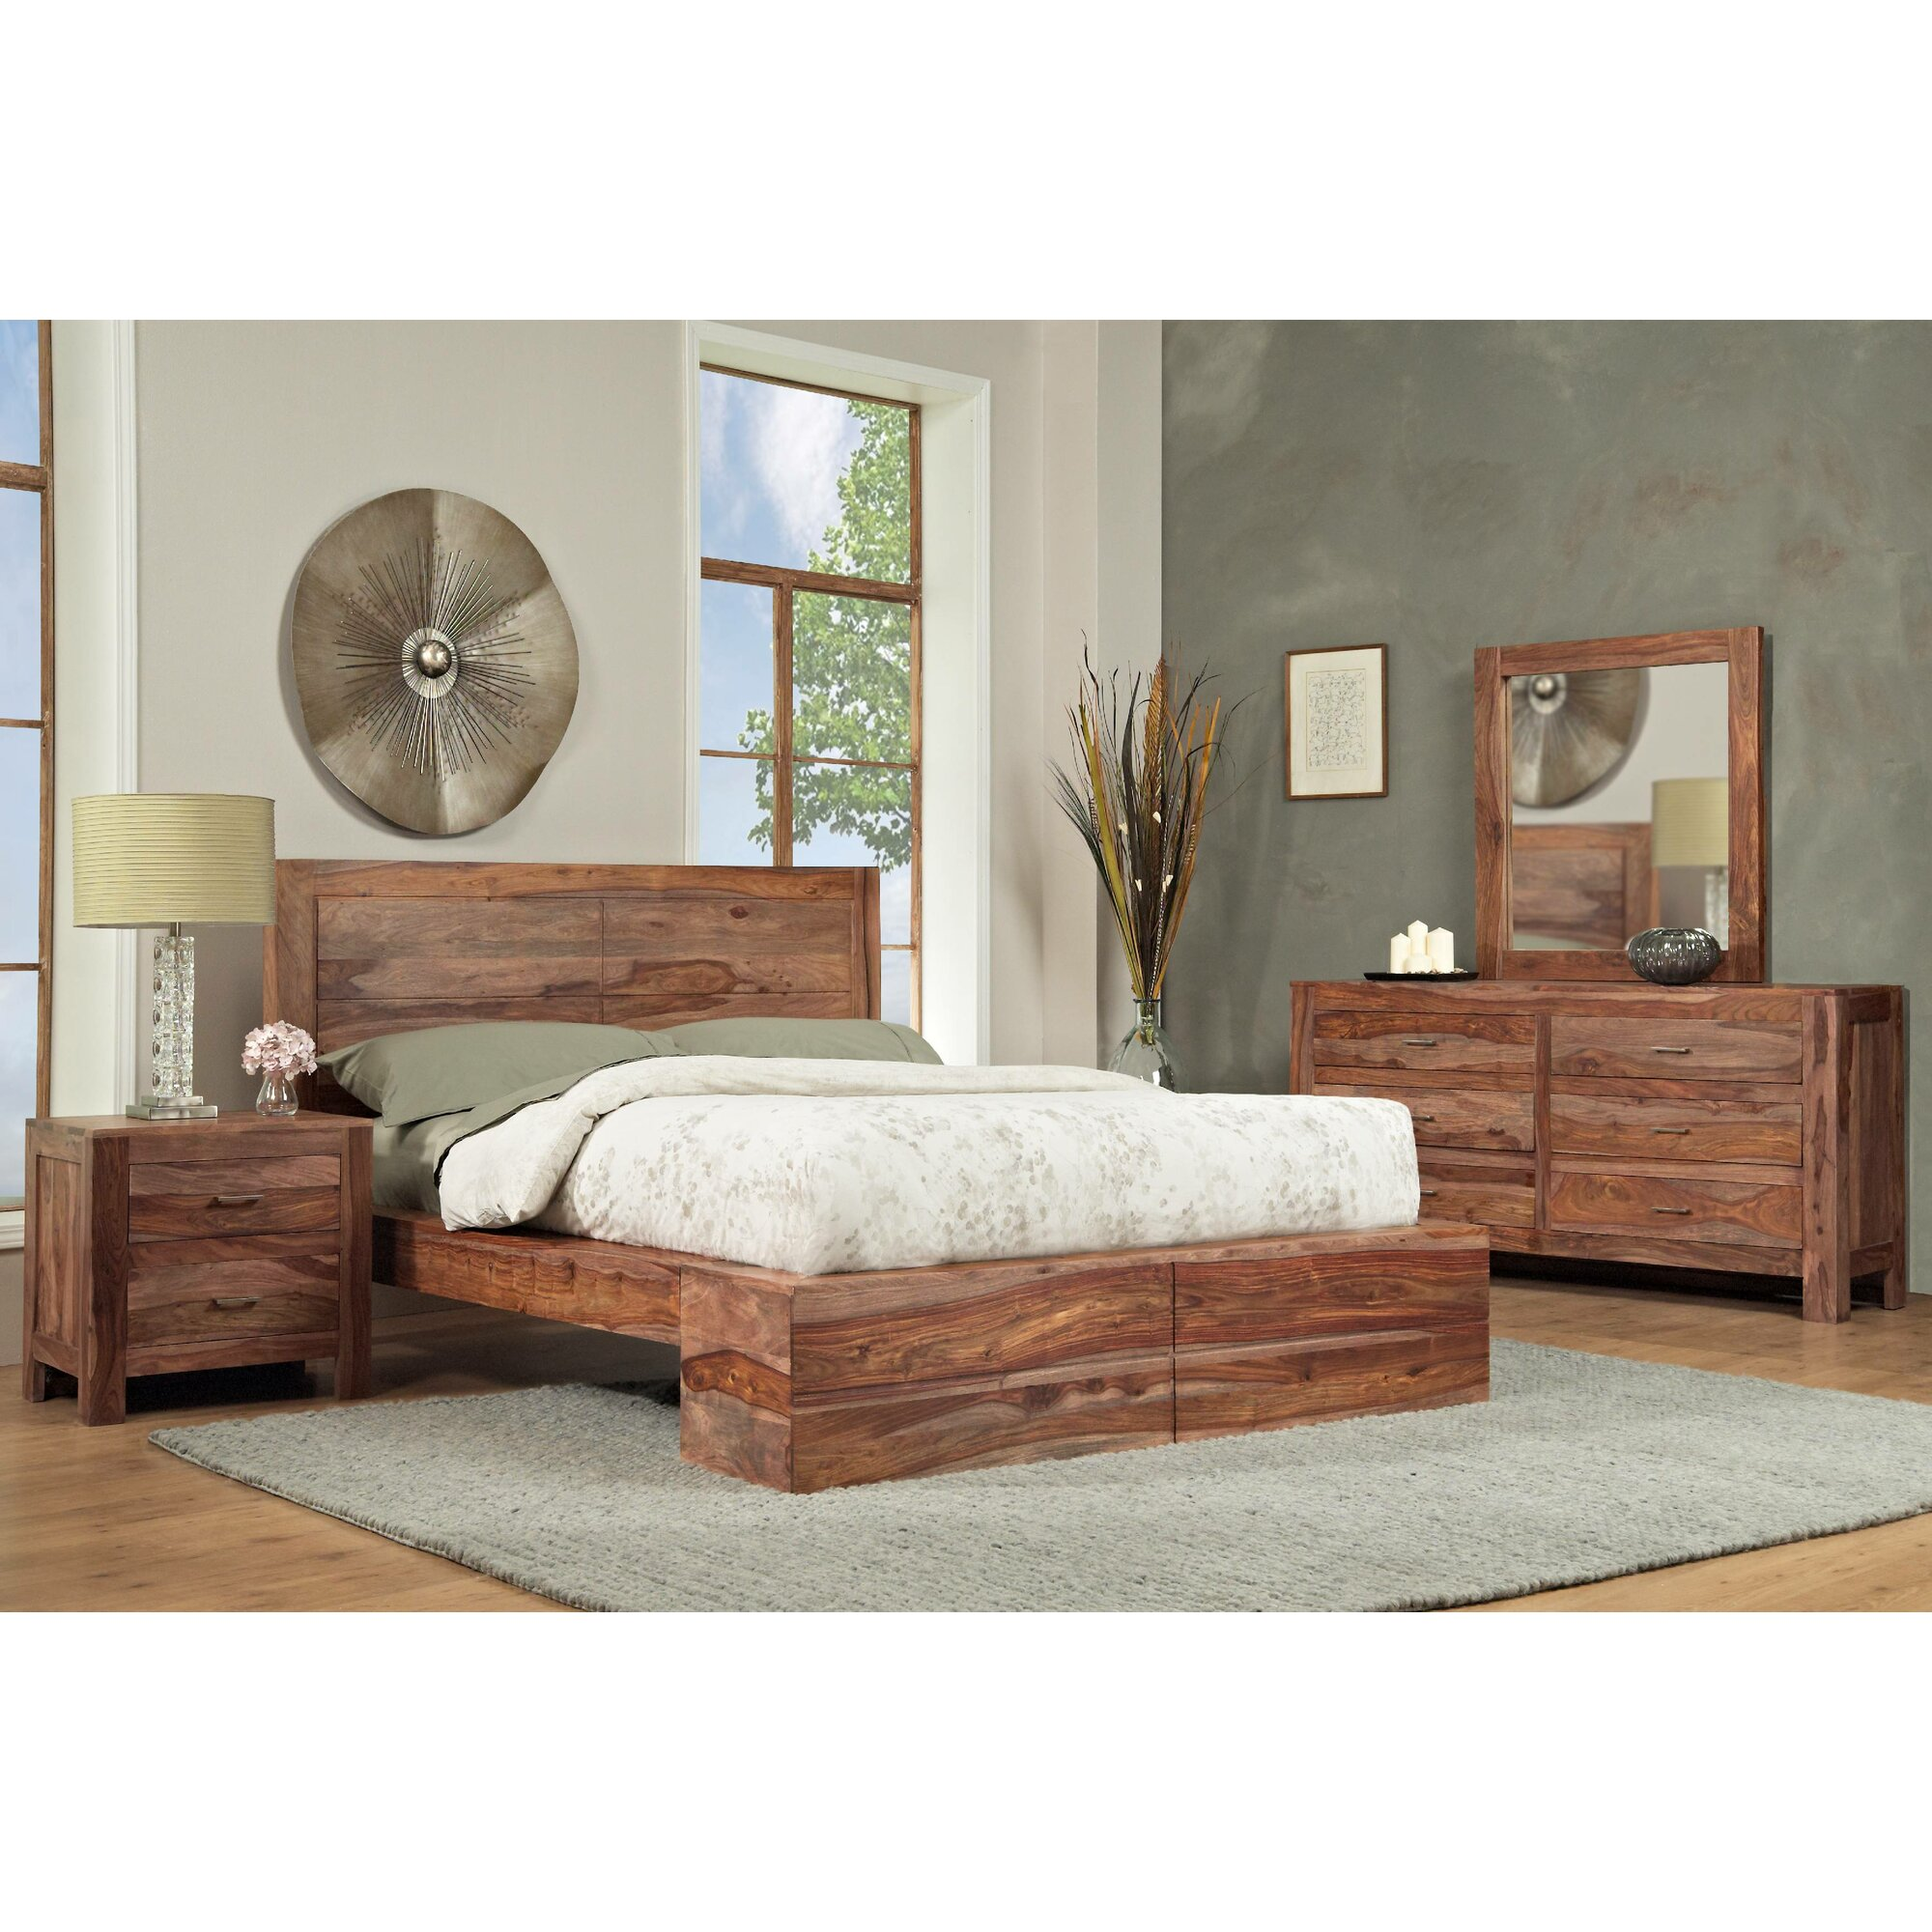 Modus Atria Platform Customizable Bedroom Set & Reviews | Wayfair